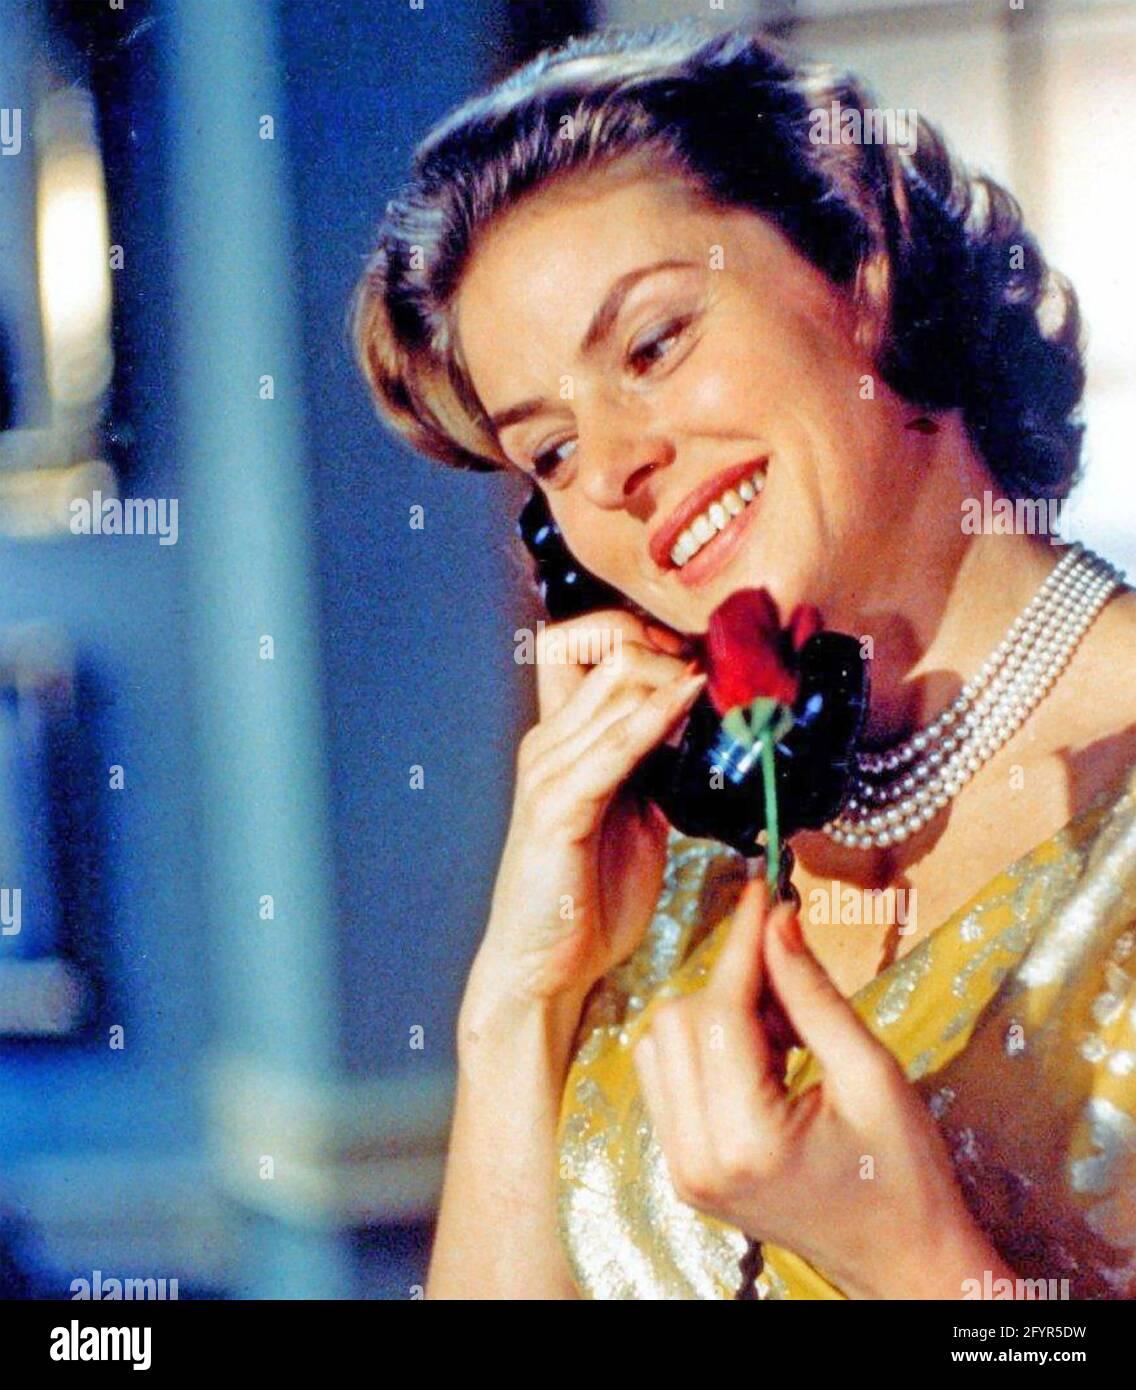 INGRID BERGMAN (1915-1982) Swedish Film attrice circa 1955 Foto Stock